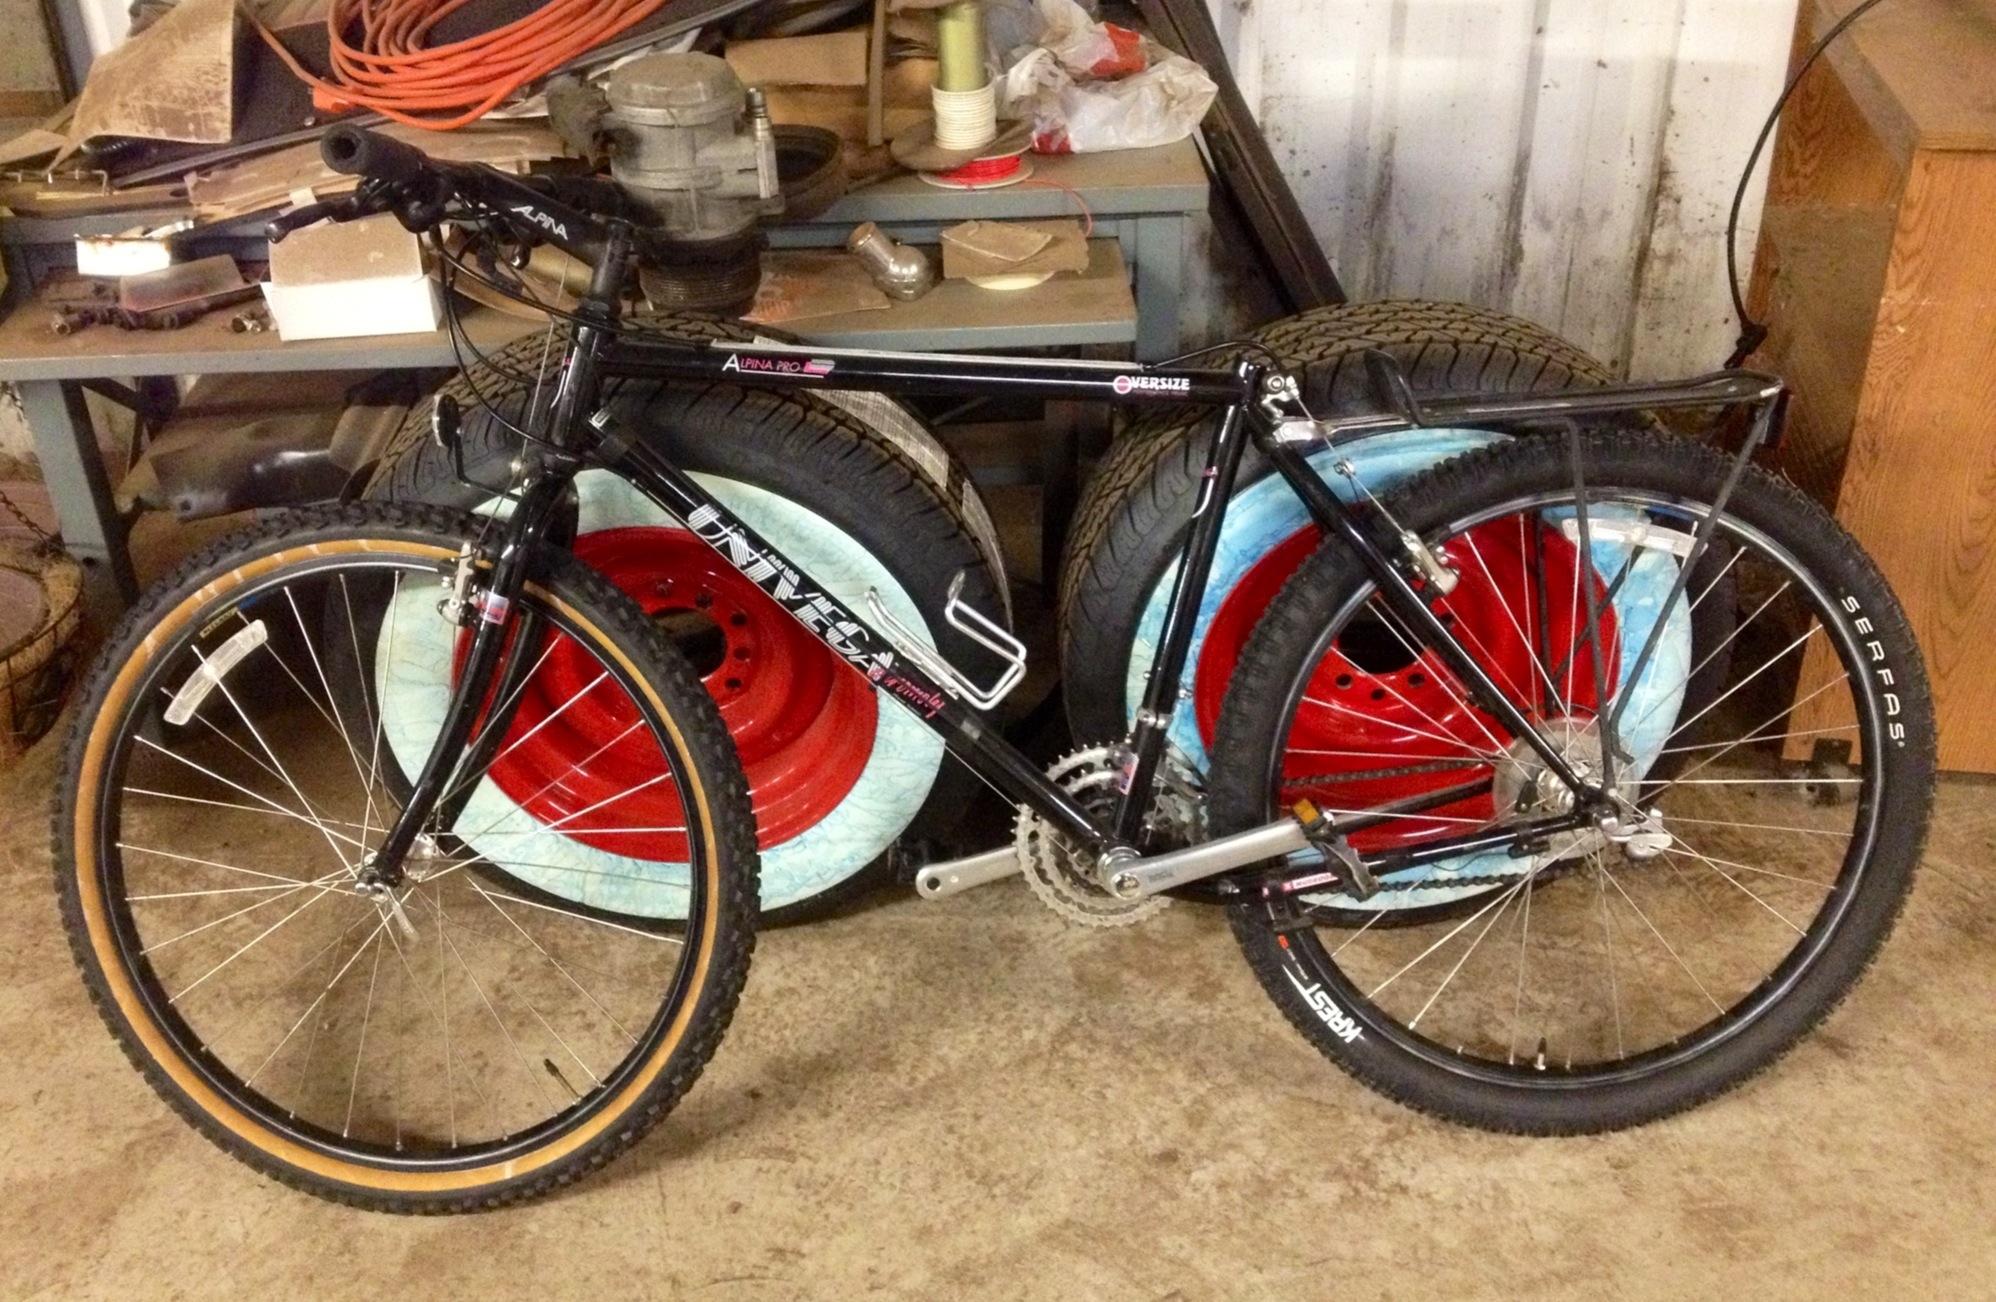 Classic Univega Alpina Pro Lawee Design Mountain Bike Scored at ...